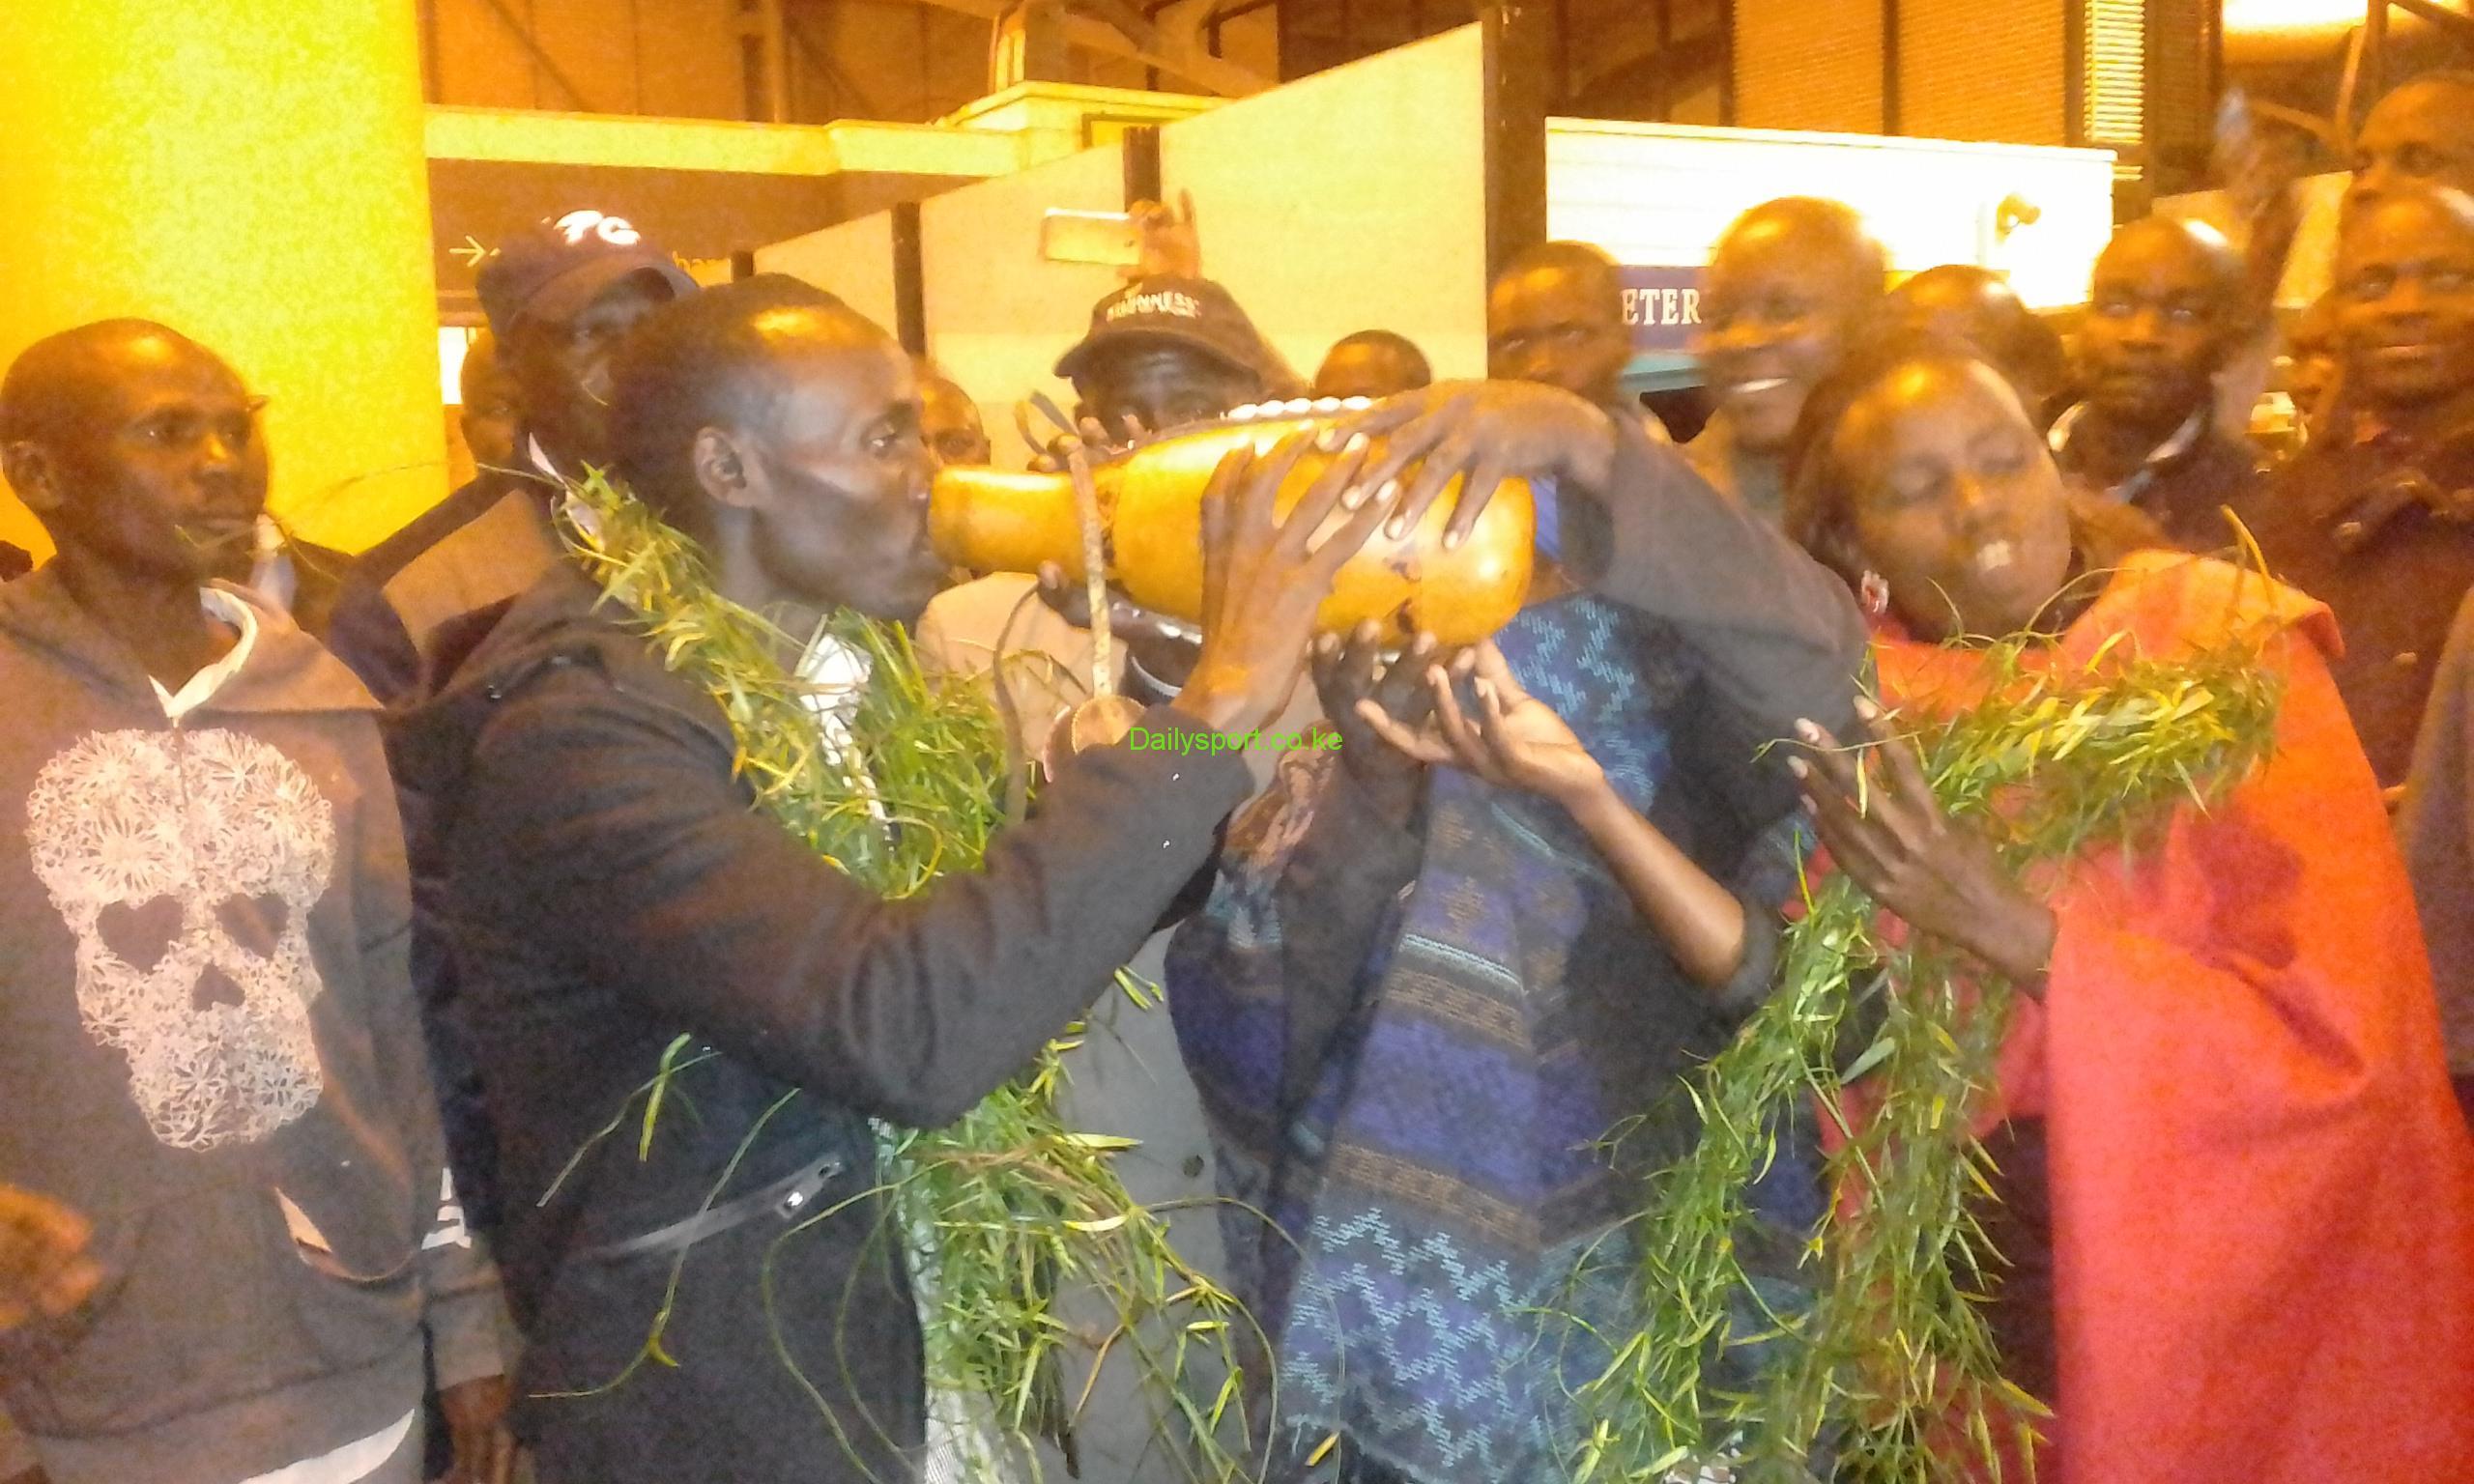 Eldoret International Airport, Amsterdam Marathon, Lawrence Cherono, Daniel Wanjiru, Nobert Kigen, Dr. Gabriela Rosa, Rosa Associati, Abraham Kiptum,